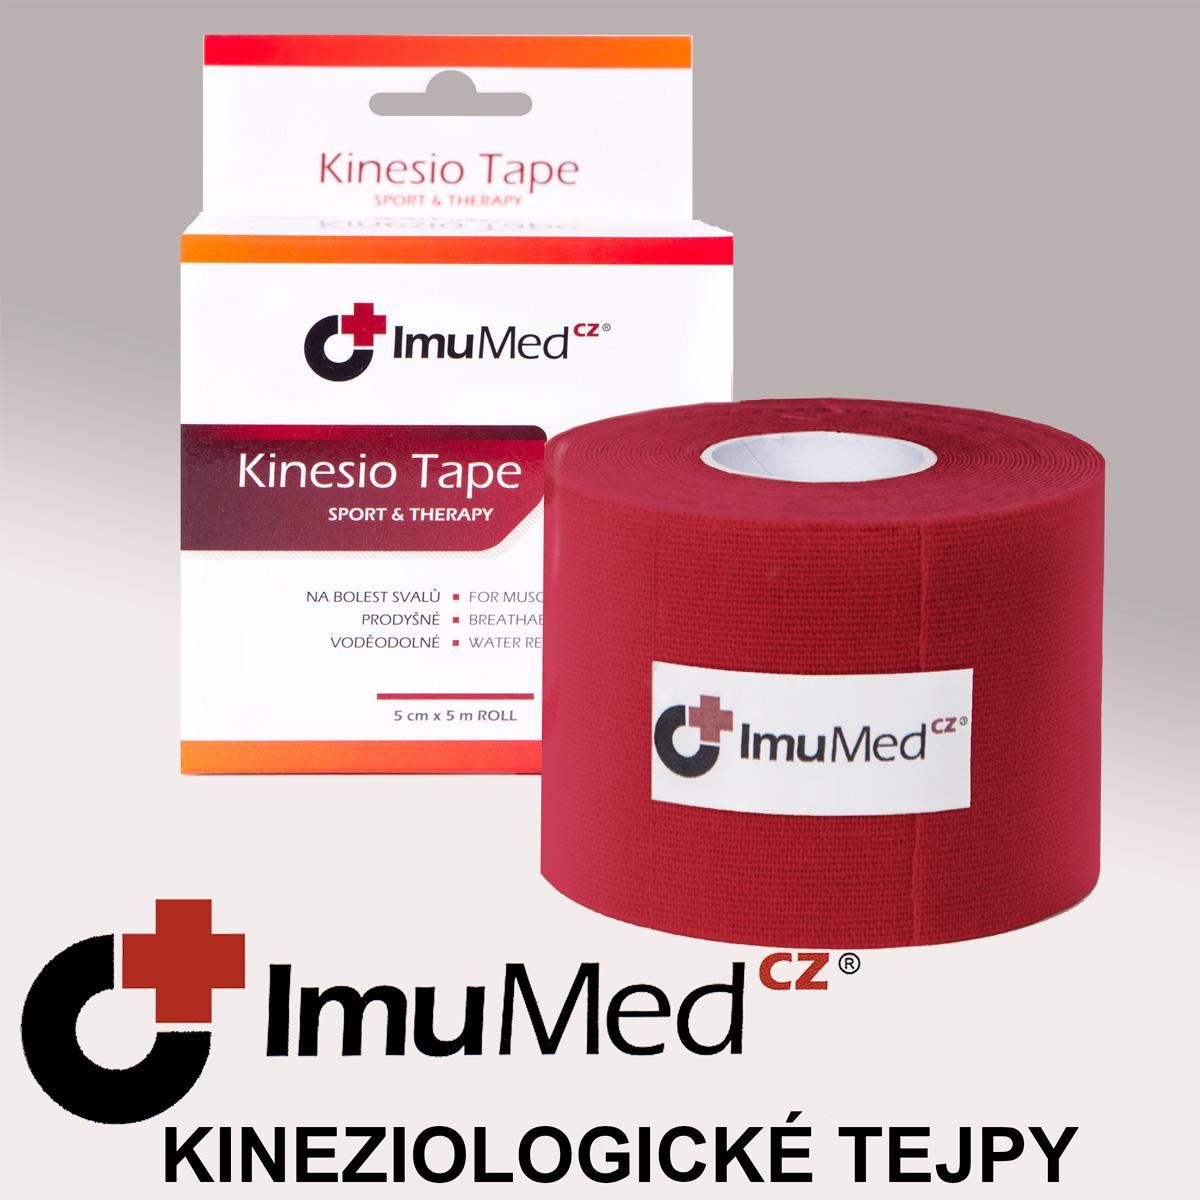 ImuMedCZ Kinesio Tape, tejpovací páska červená 5 cm x 5 m - ImuMedCZ - Kineziolologické tejpy, obinadla-ImumedCZ.cz